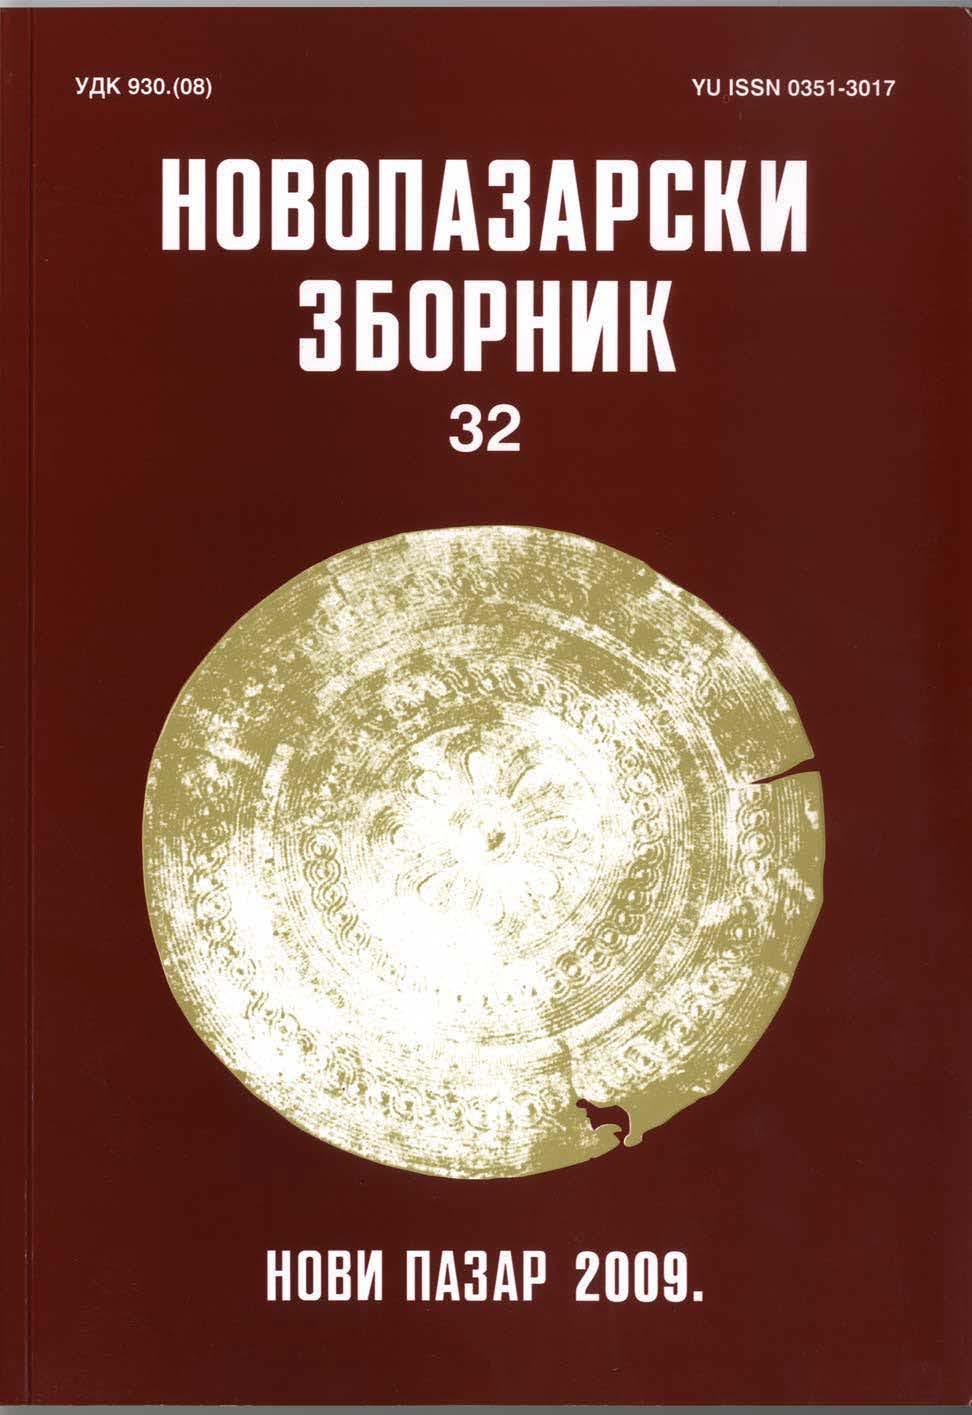 BROJ 32